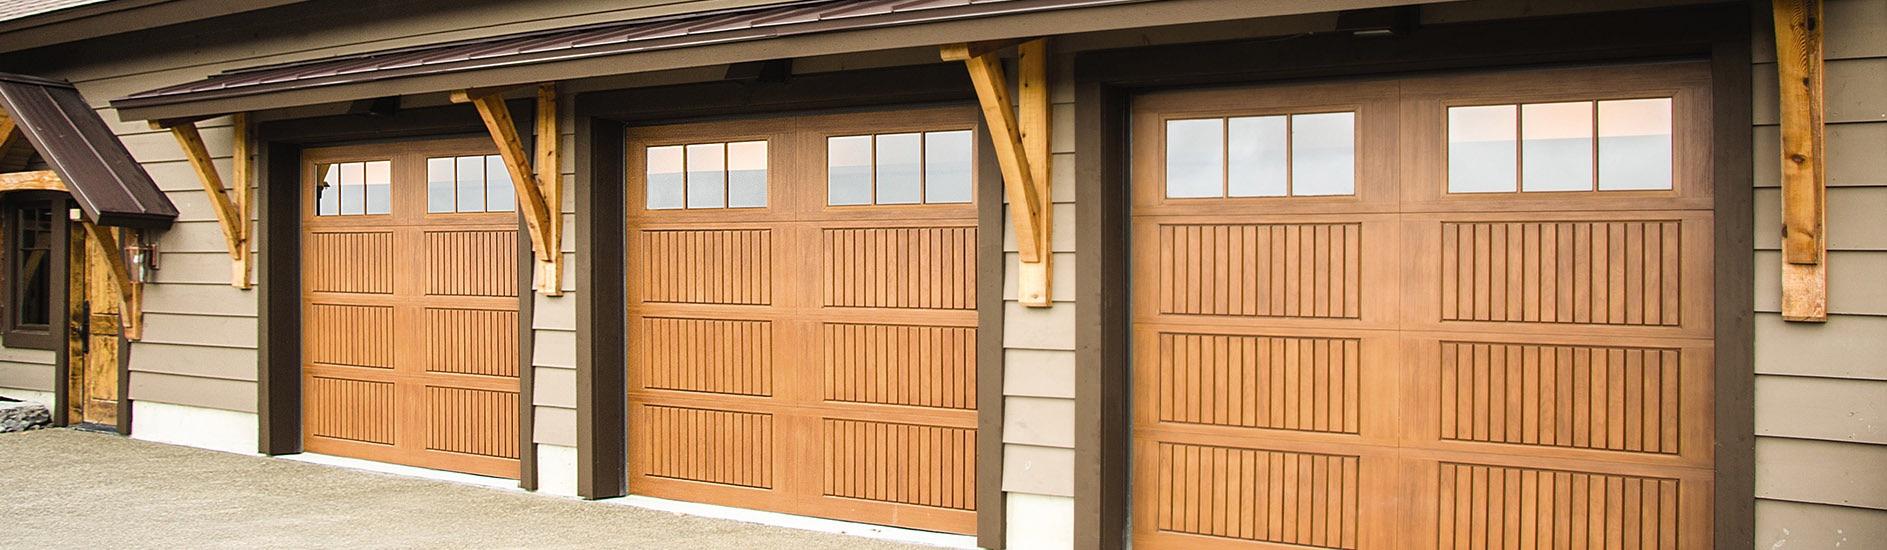 Residential Amp Commercialu00 Door Installation Amp Repair Home